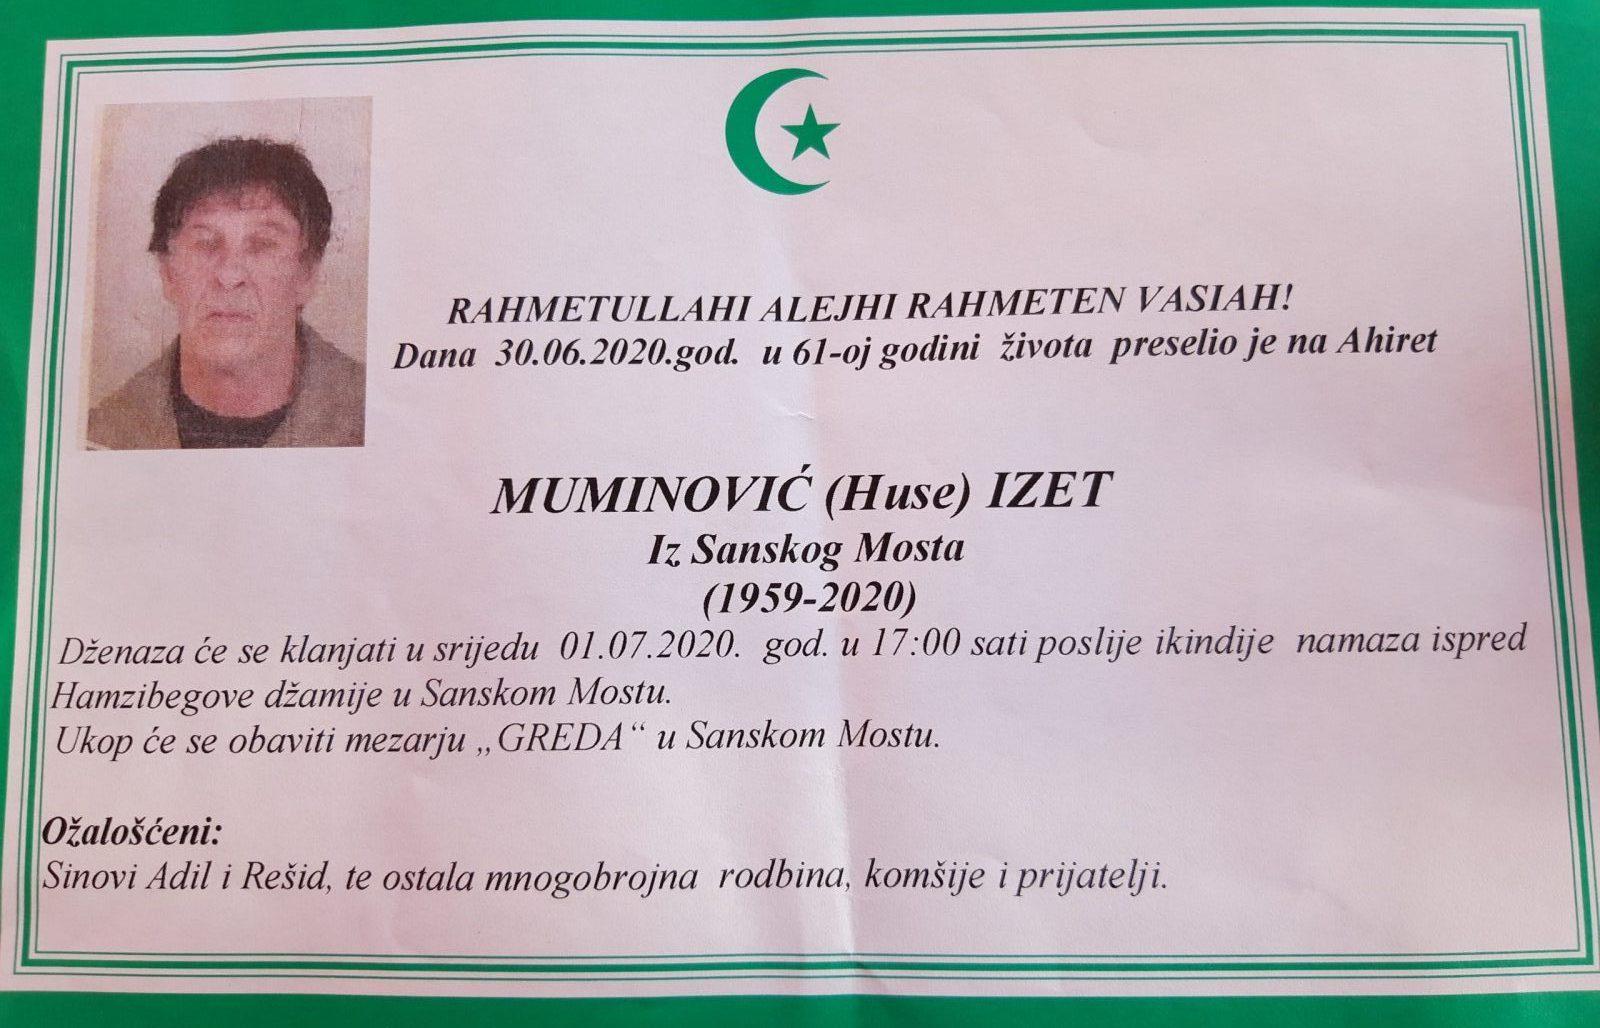 Muminović (Huse) Izet